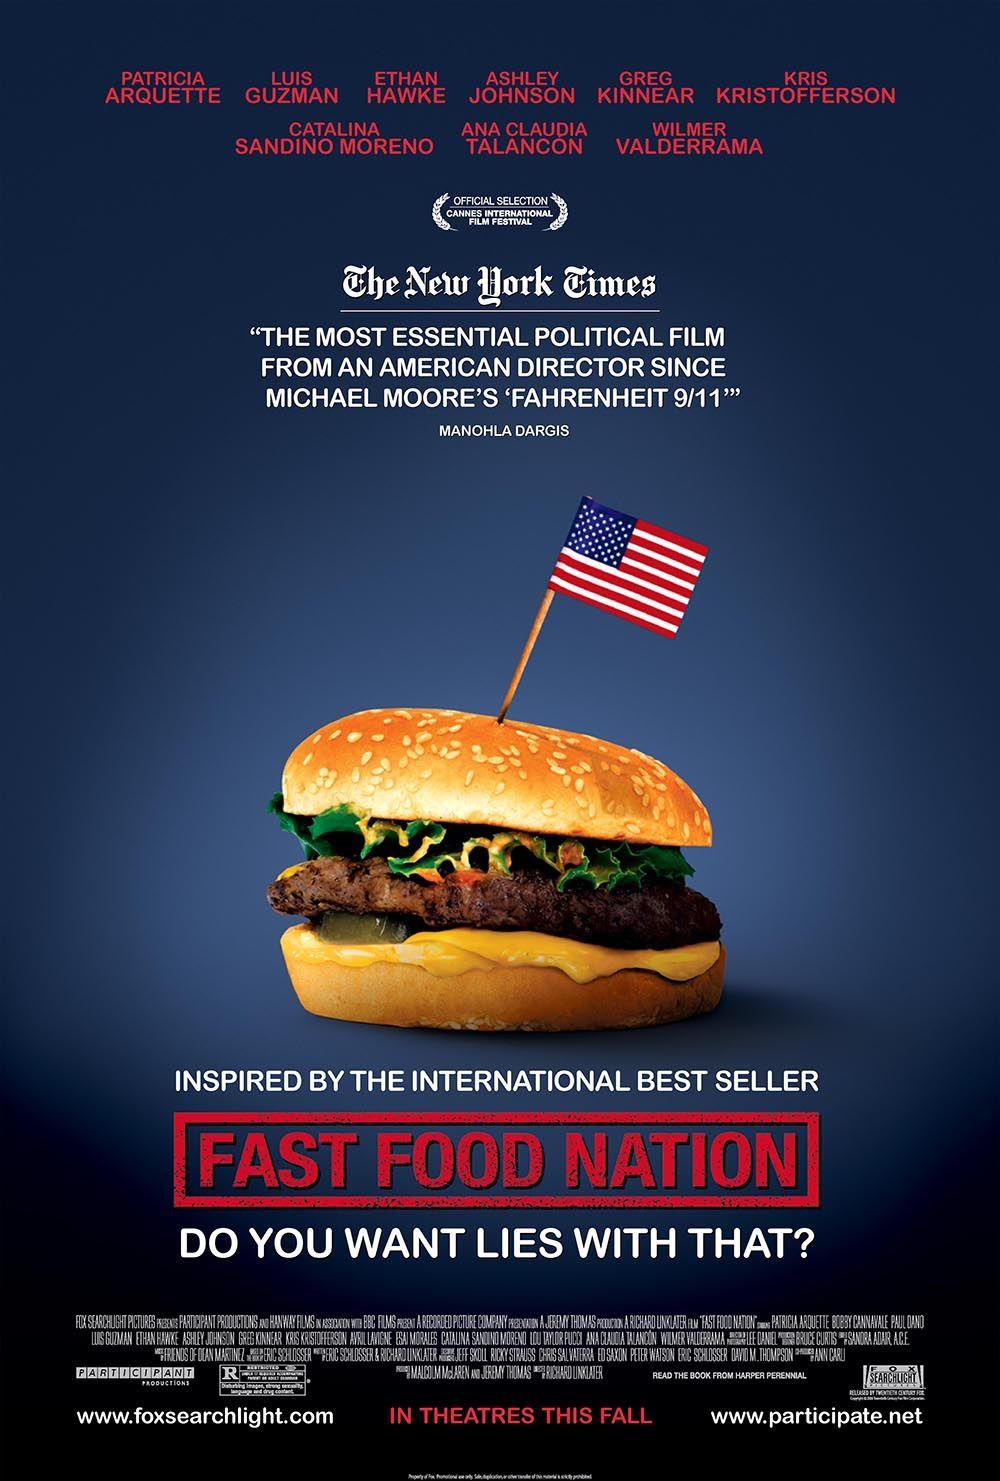 fast-food-nation-403fd4fd3cd9df0d17d60e65f2debeb5.jpg